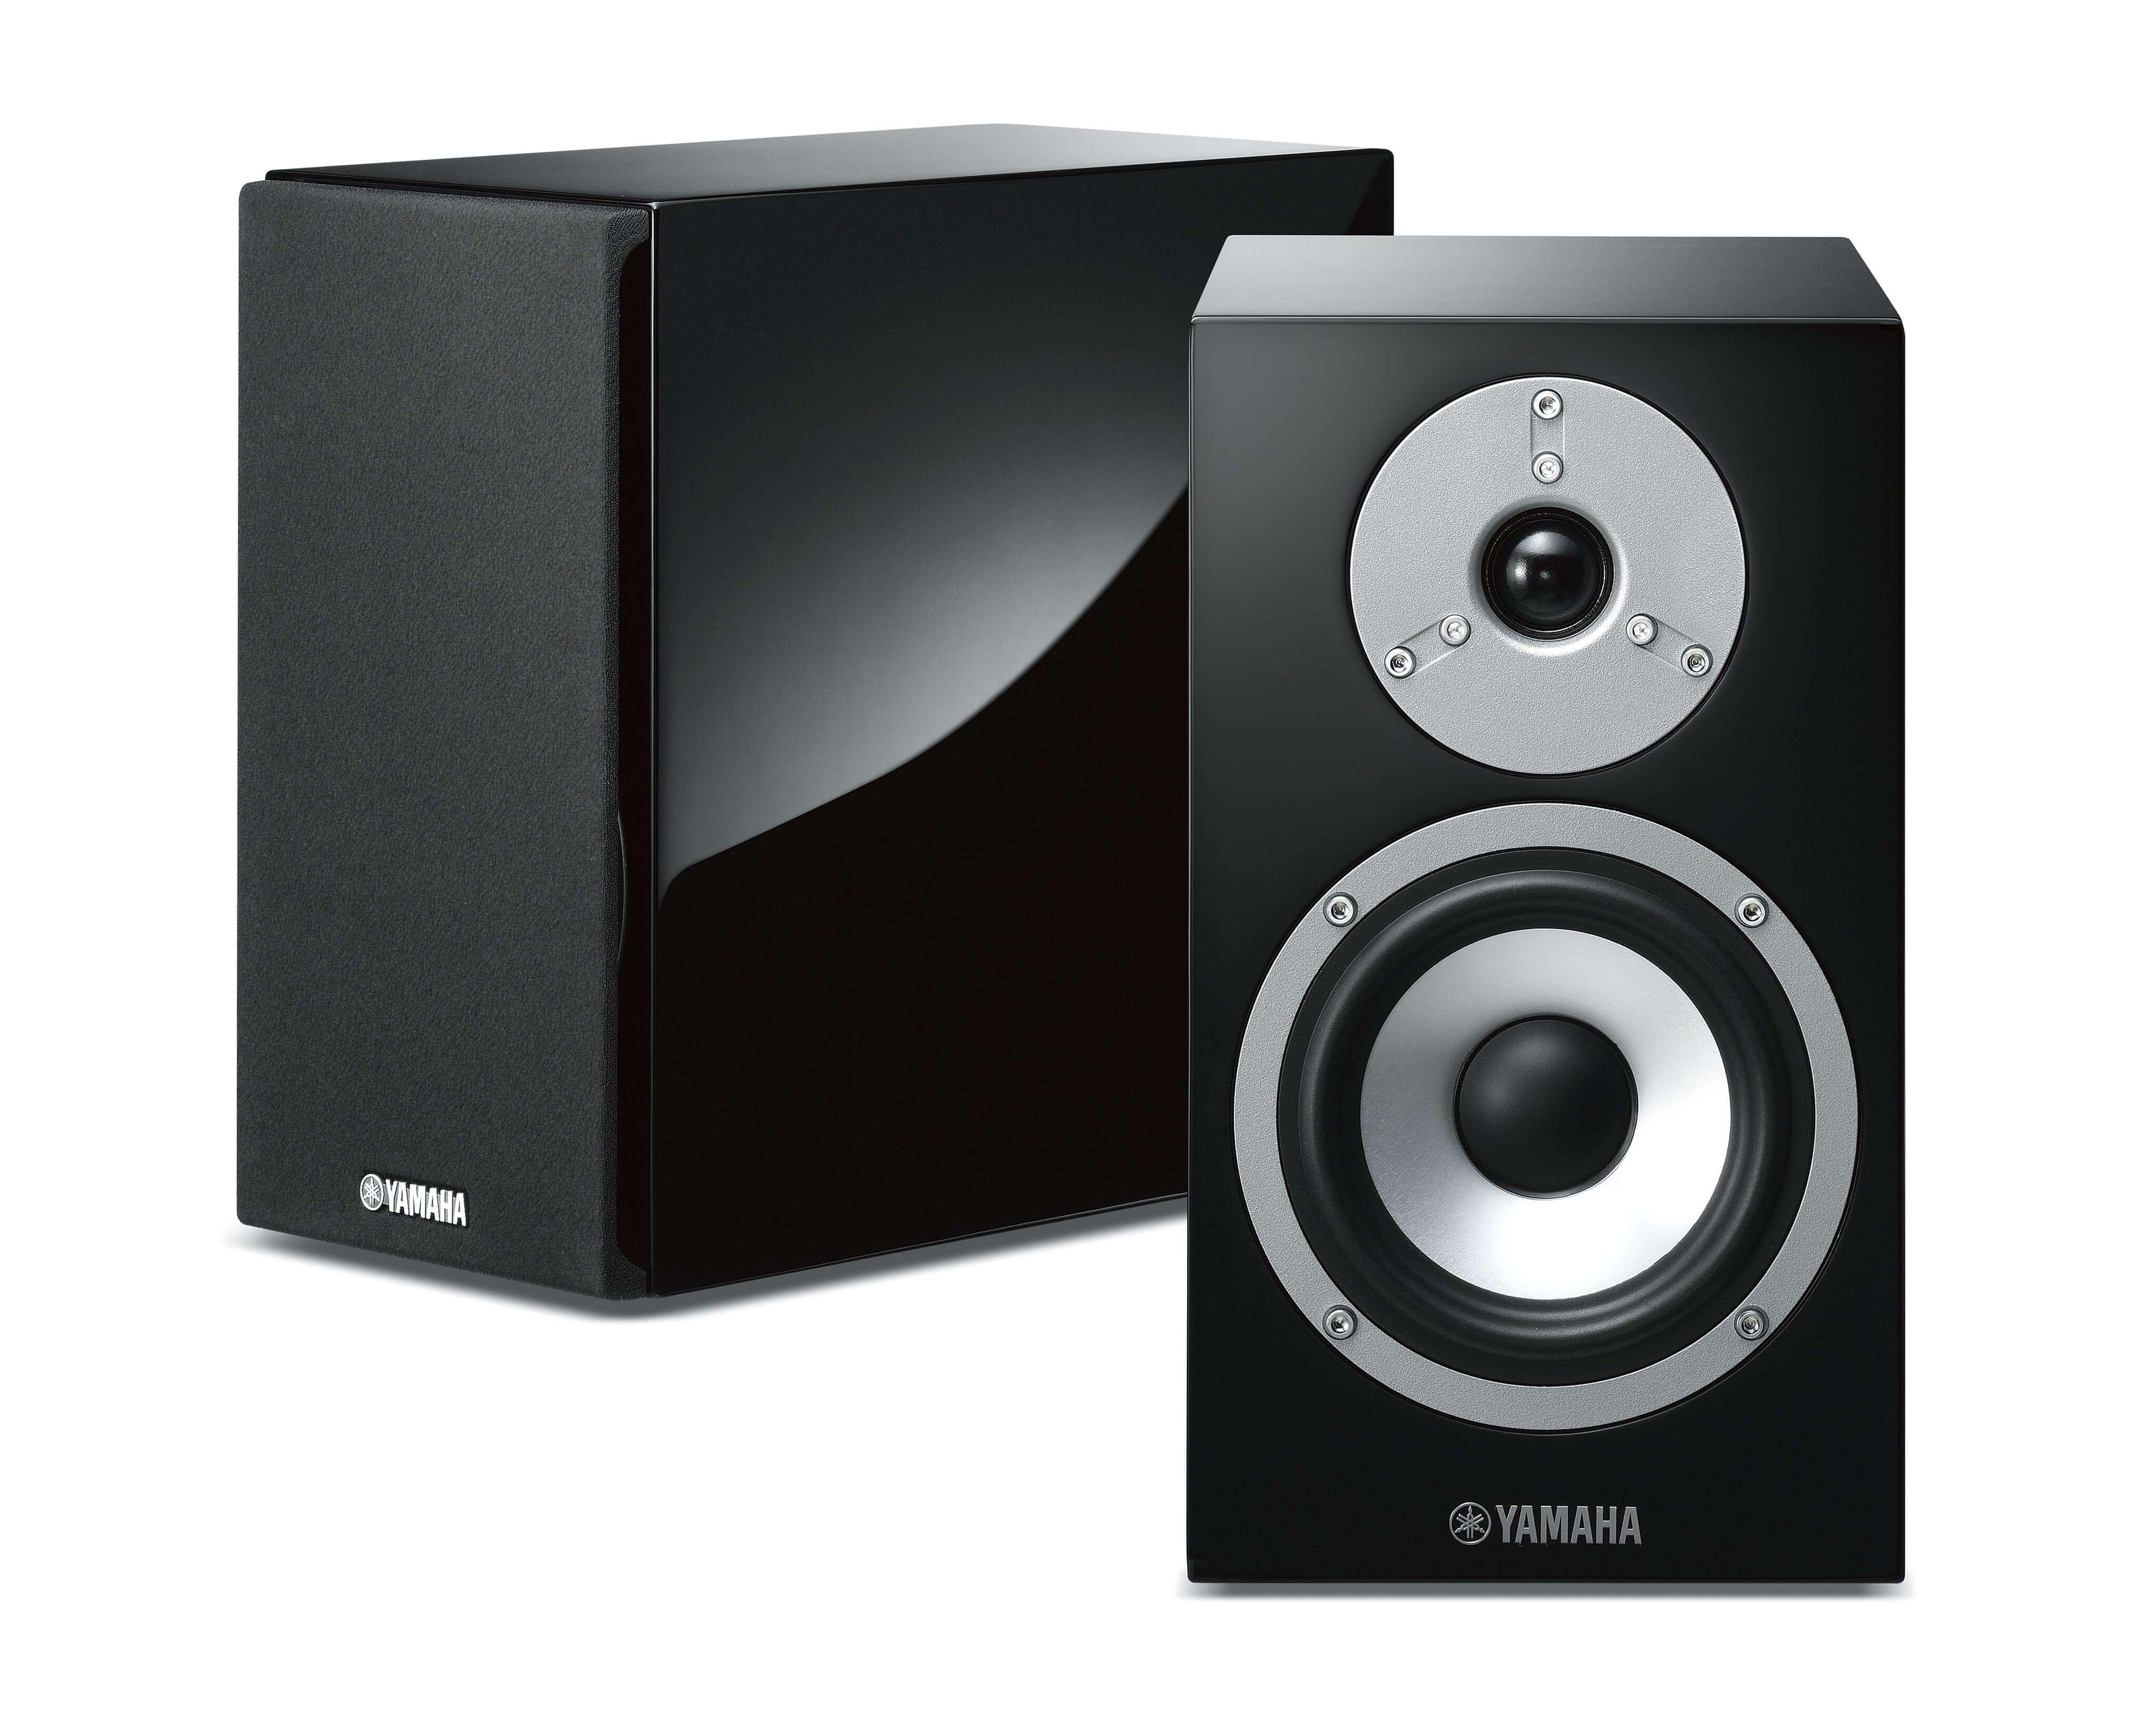 yamaha mcr n870 dab musiccast hifi system sehr hochwertig. Black Bedroom Furniture Sets. Home Design Ideas